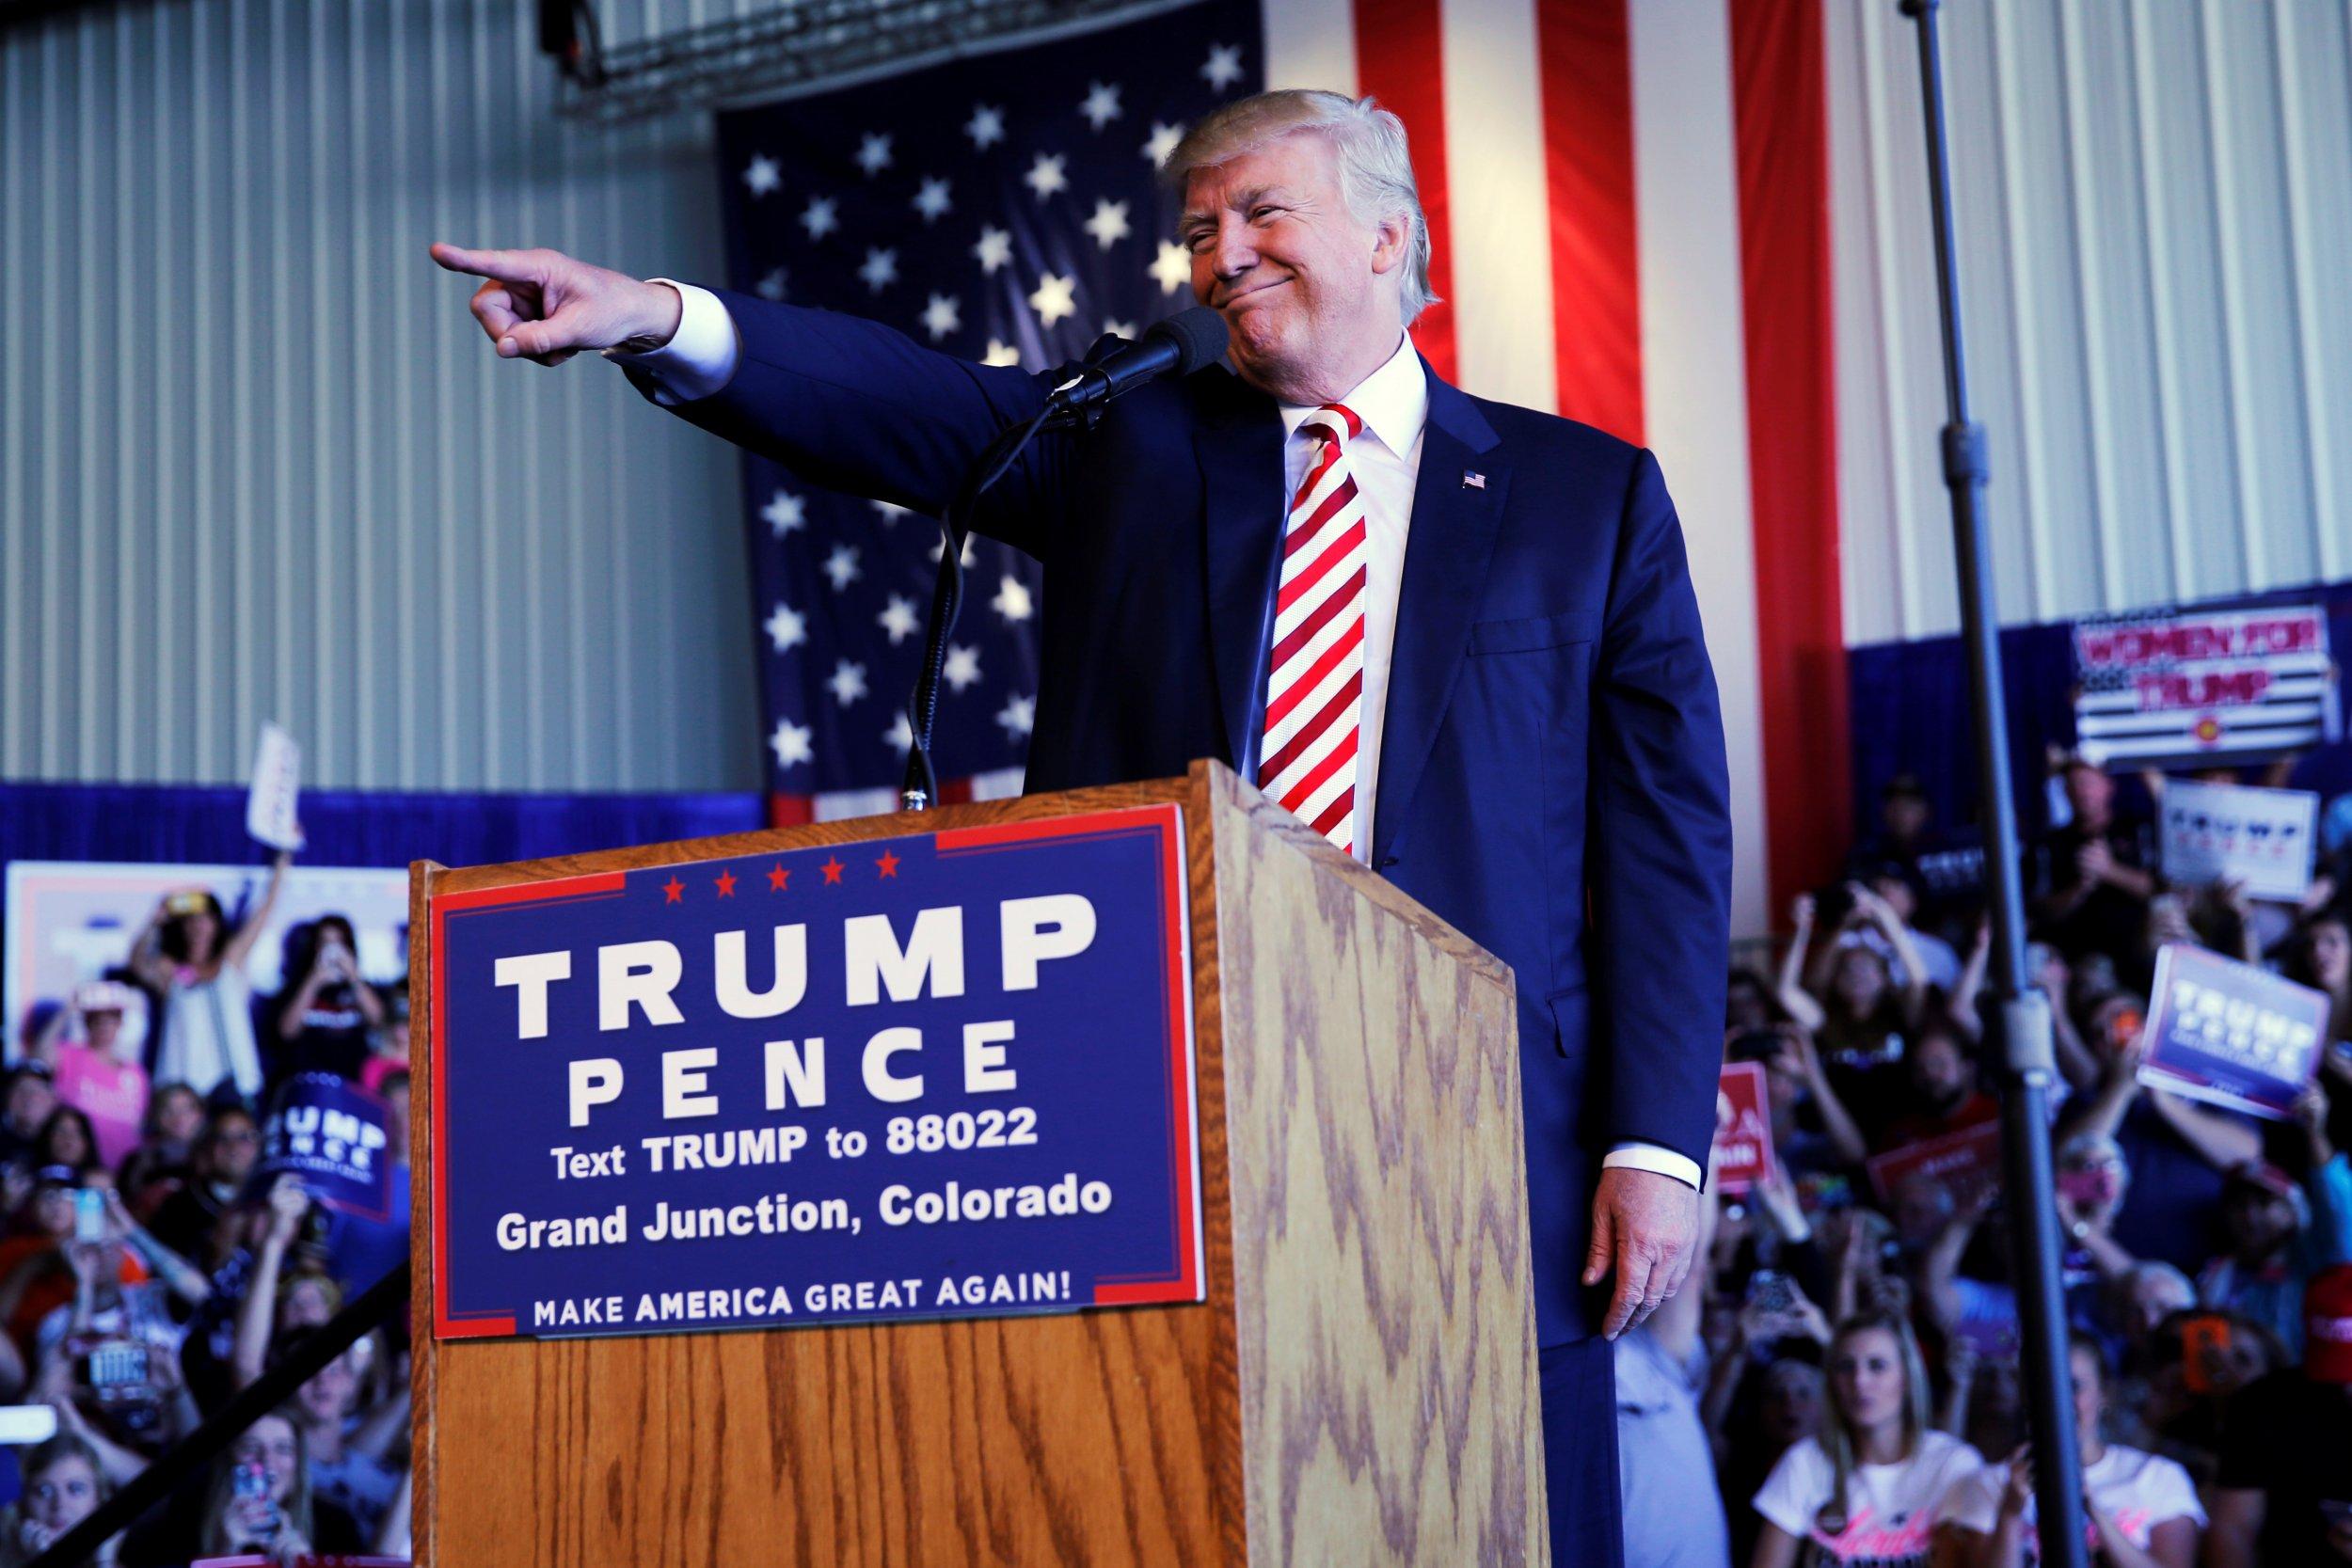 1019_Cadei_Trump immigration debate